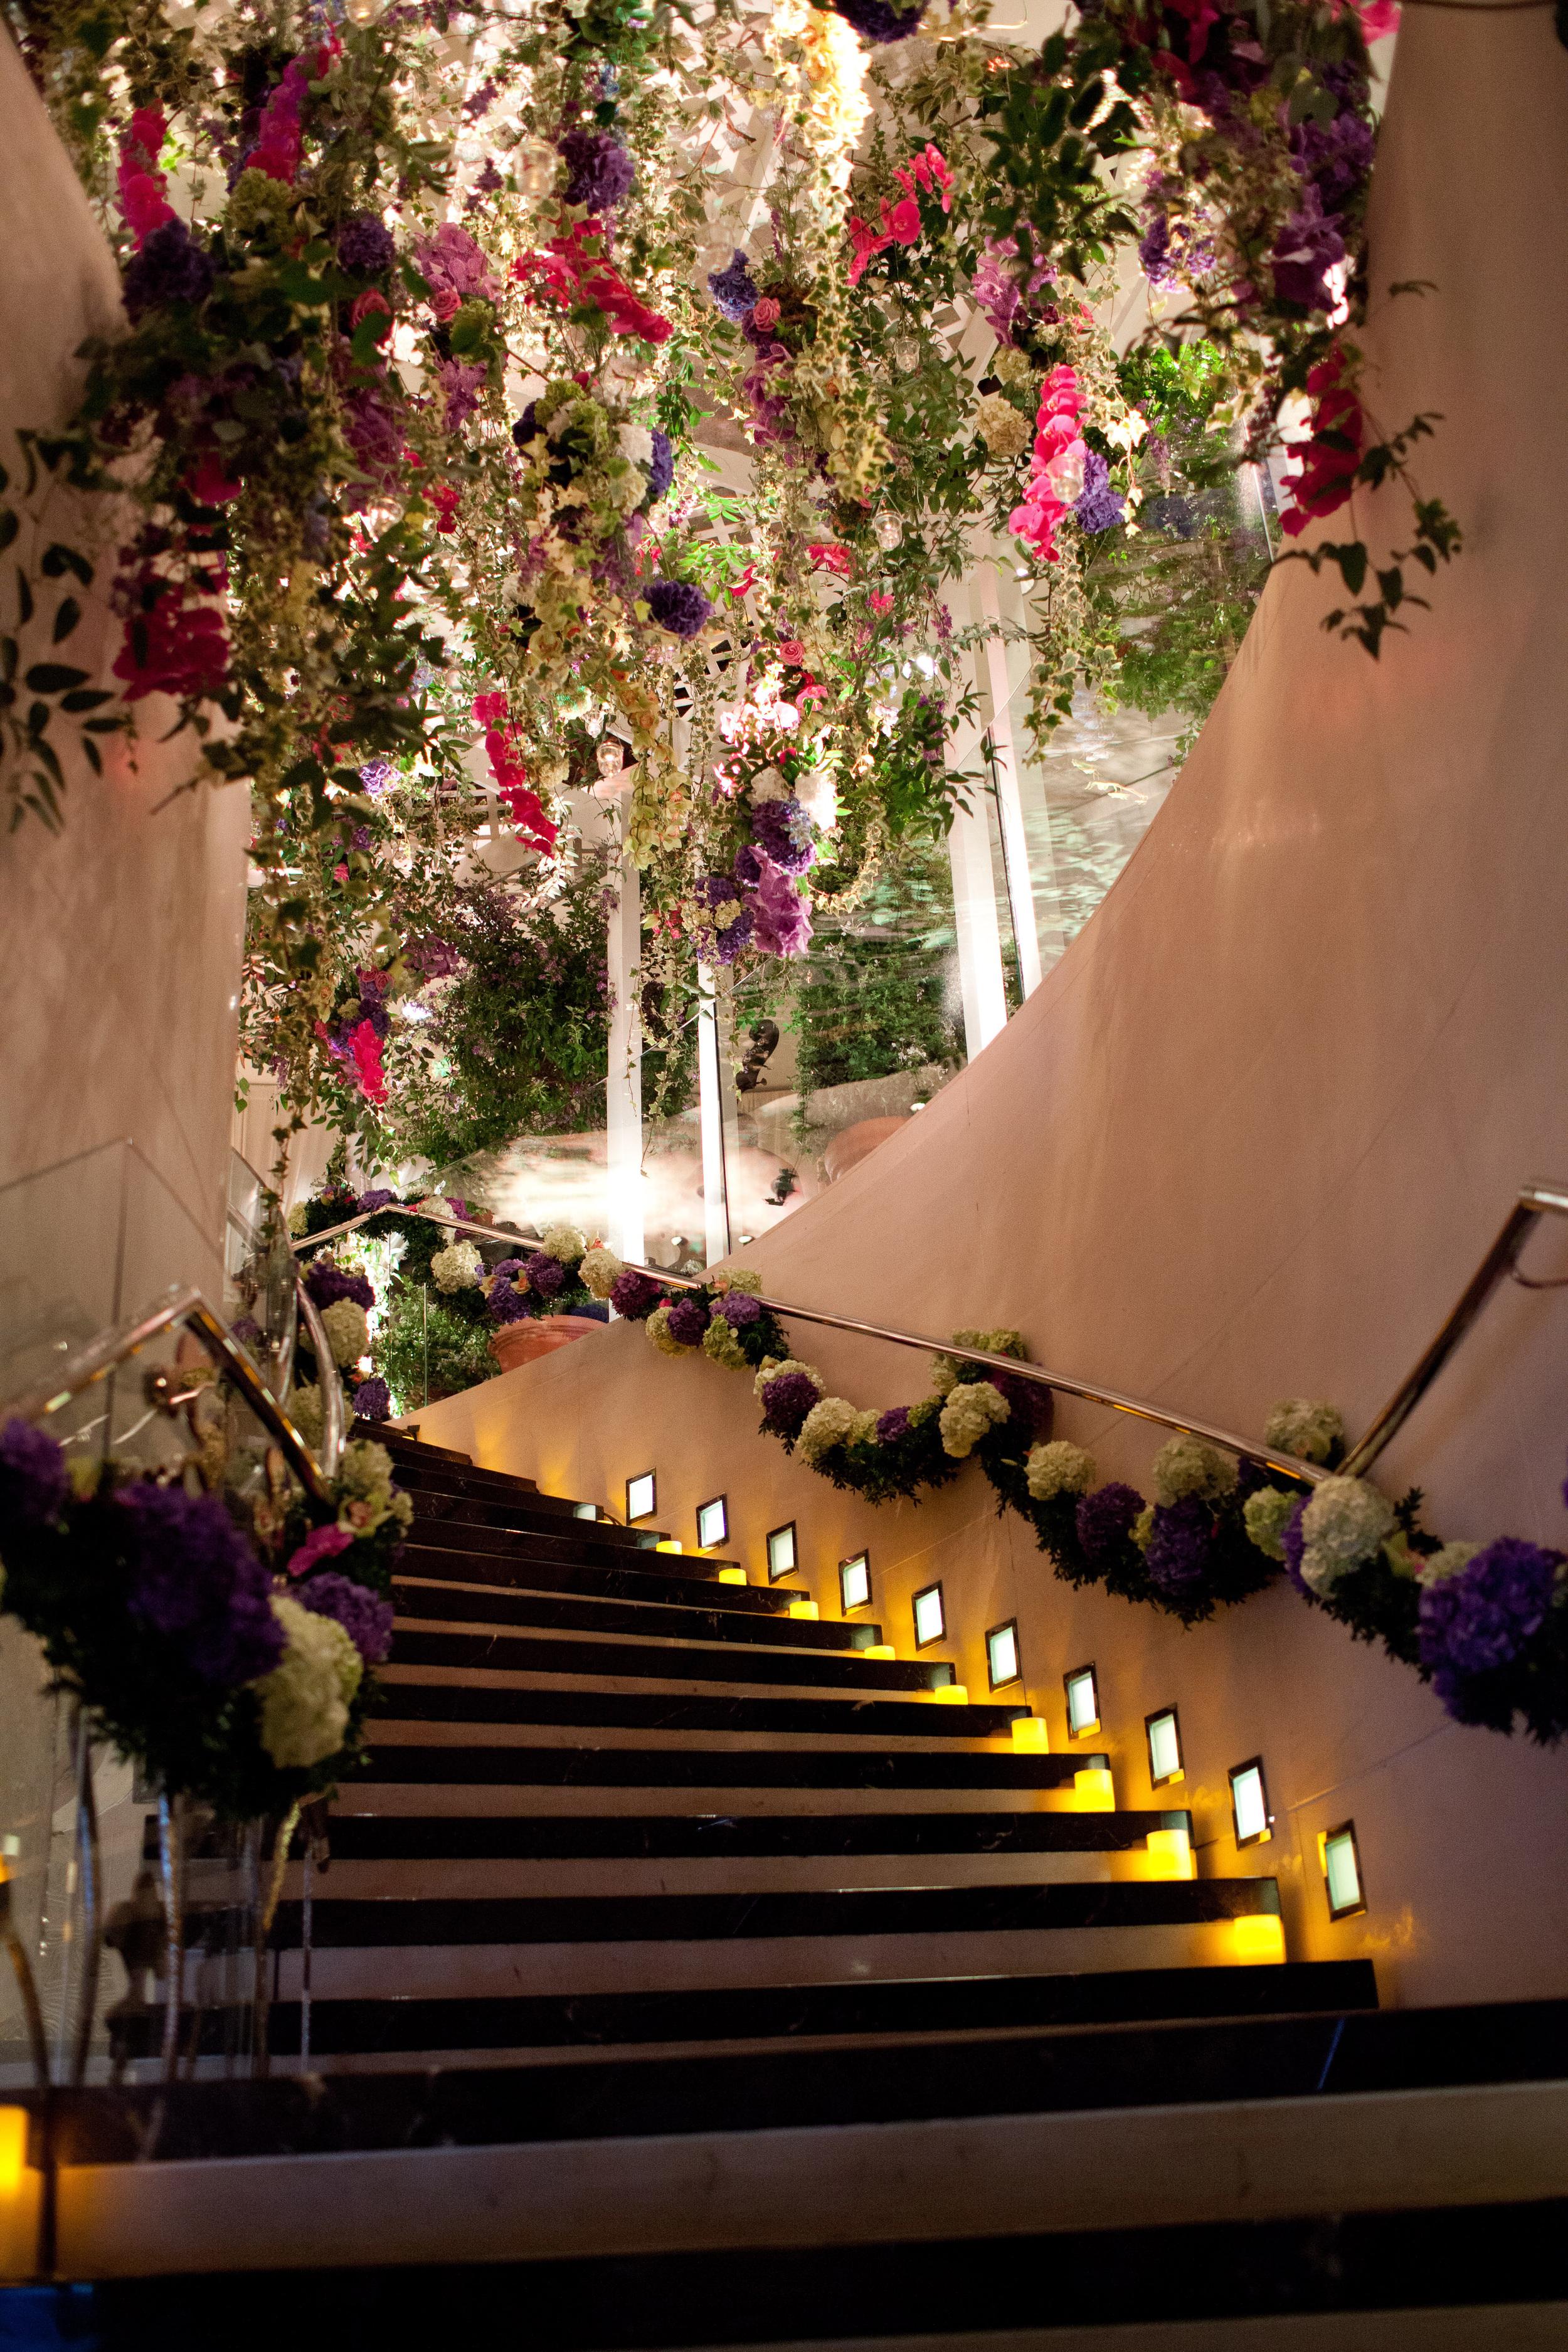 mandarin_oriental_new_york_city_branding_inspiration_lavender_silver_wedding_floral_purple_v284_18.jpg